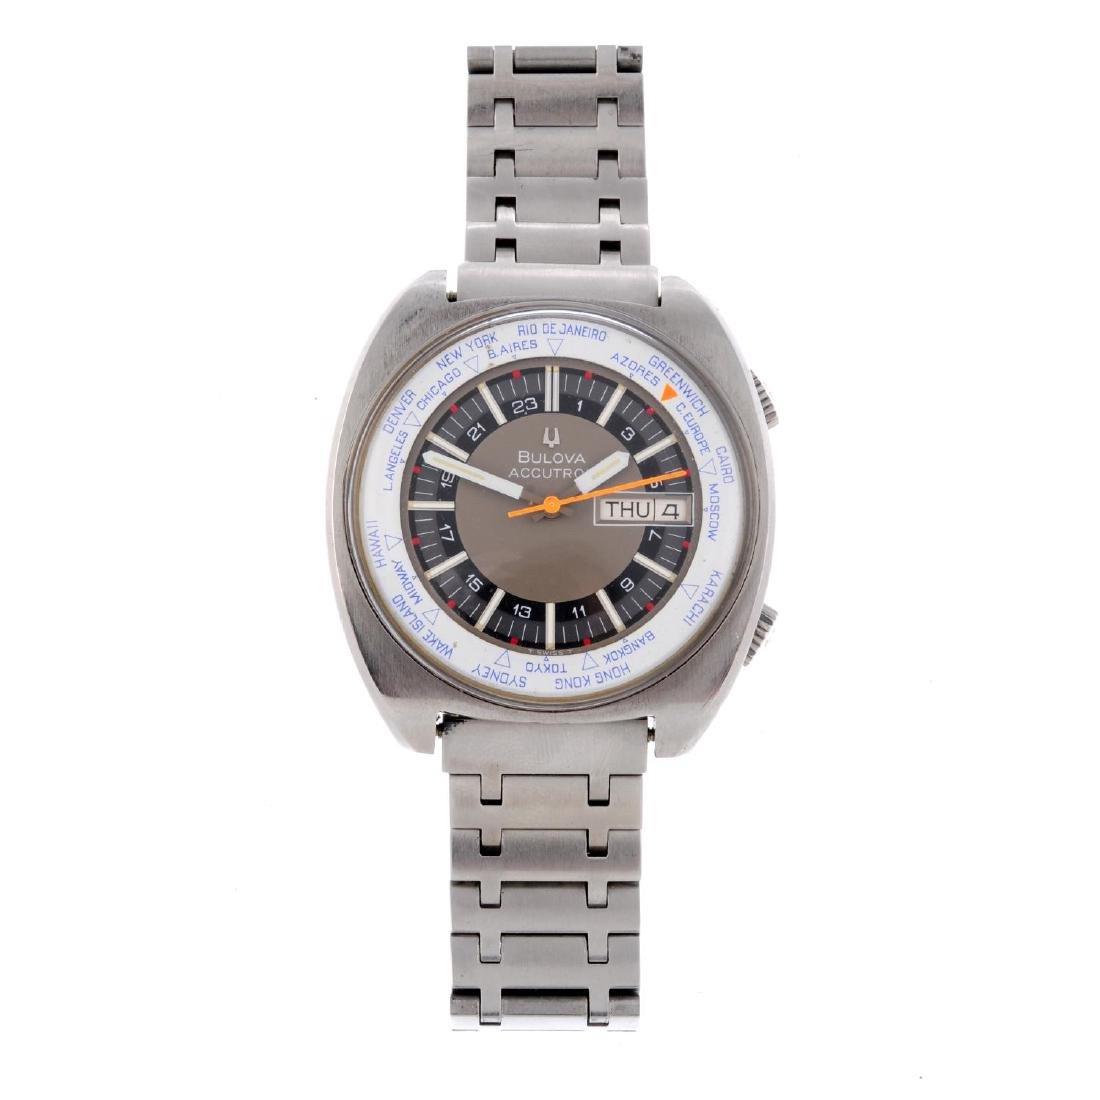 BULOVA - a gentleman's Accutron World Time bracelet